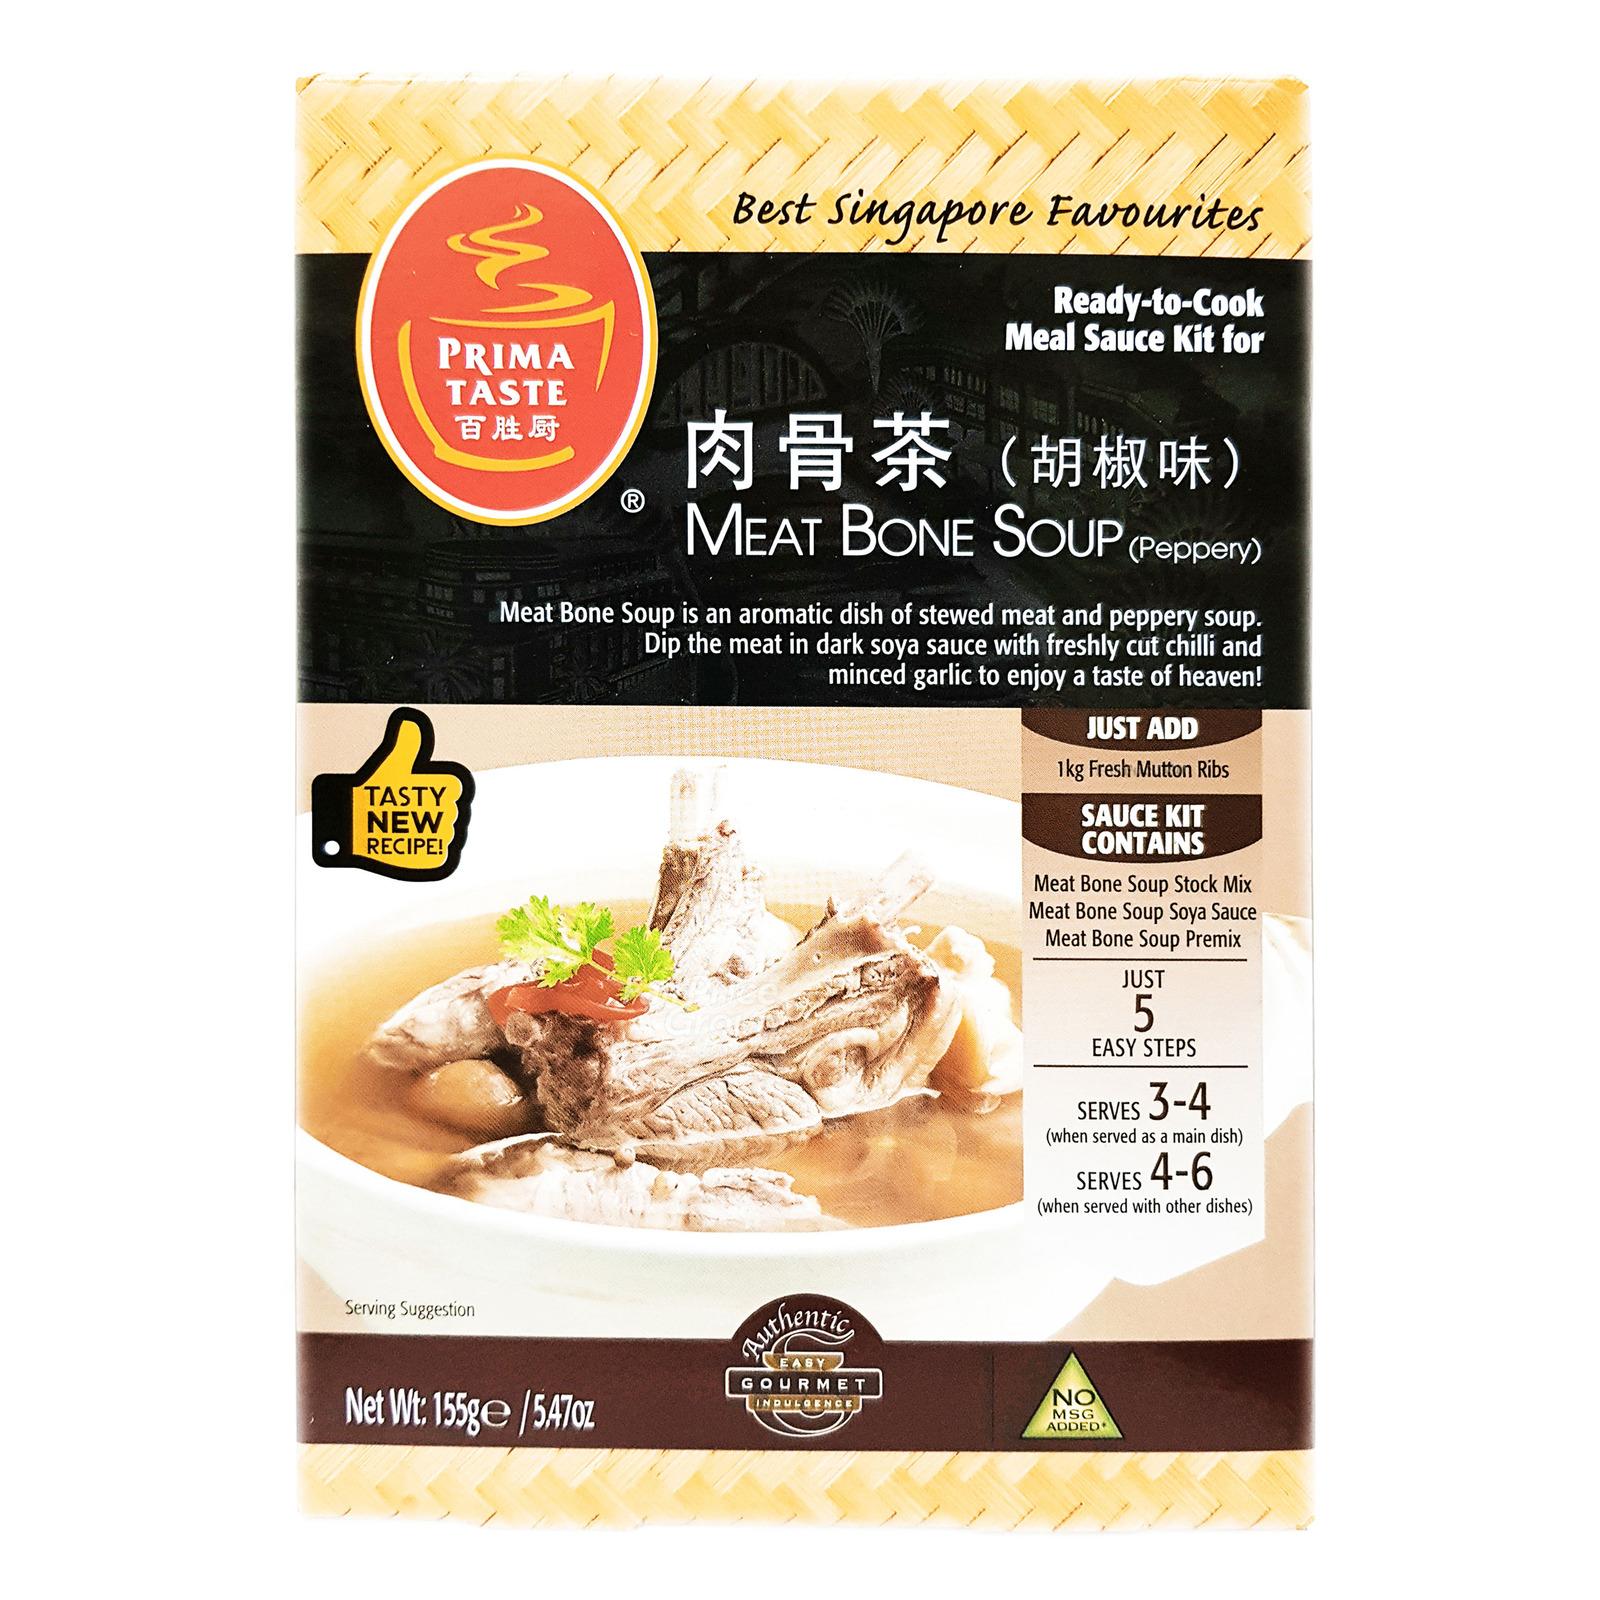 Prima Taste Meal Sauce Kit - Meat Bone Soup (Peppery)